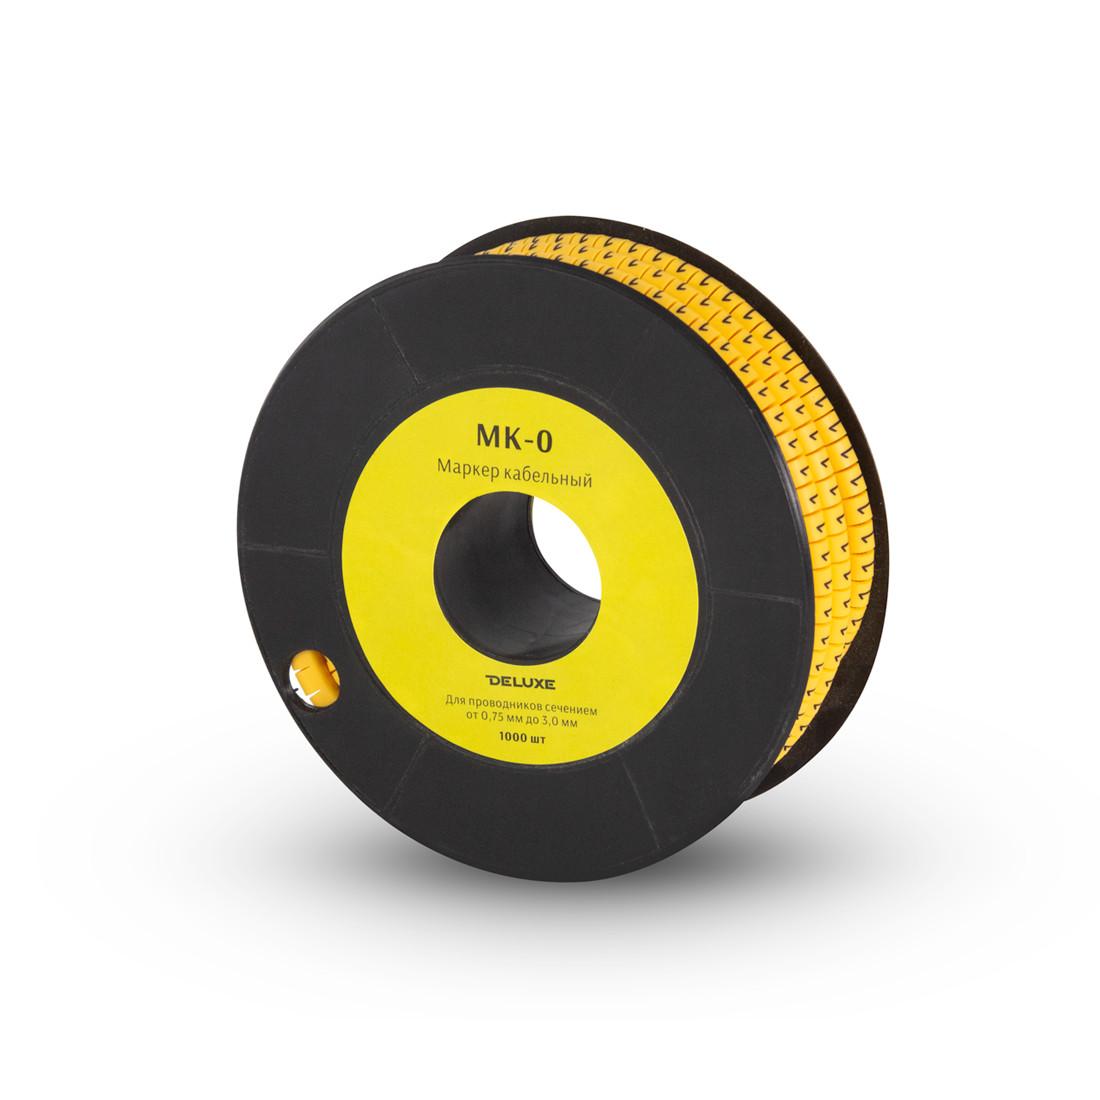 "Маркер кабельный Deluxe МК-0 (075-30 мм) символ ""9"" (1000 шт/упак.)"